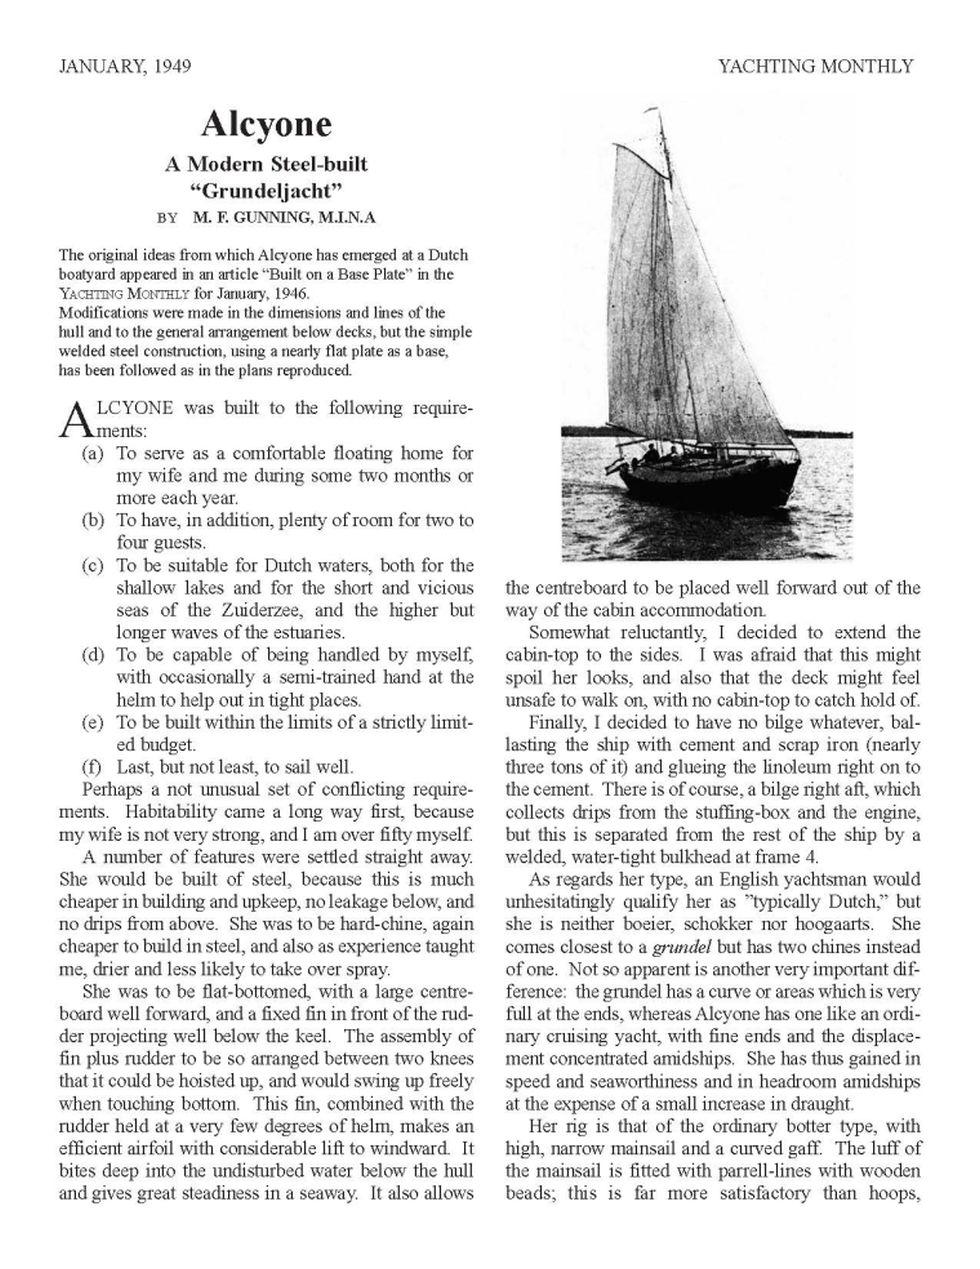 MG2_Page_1